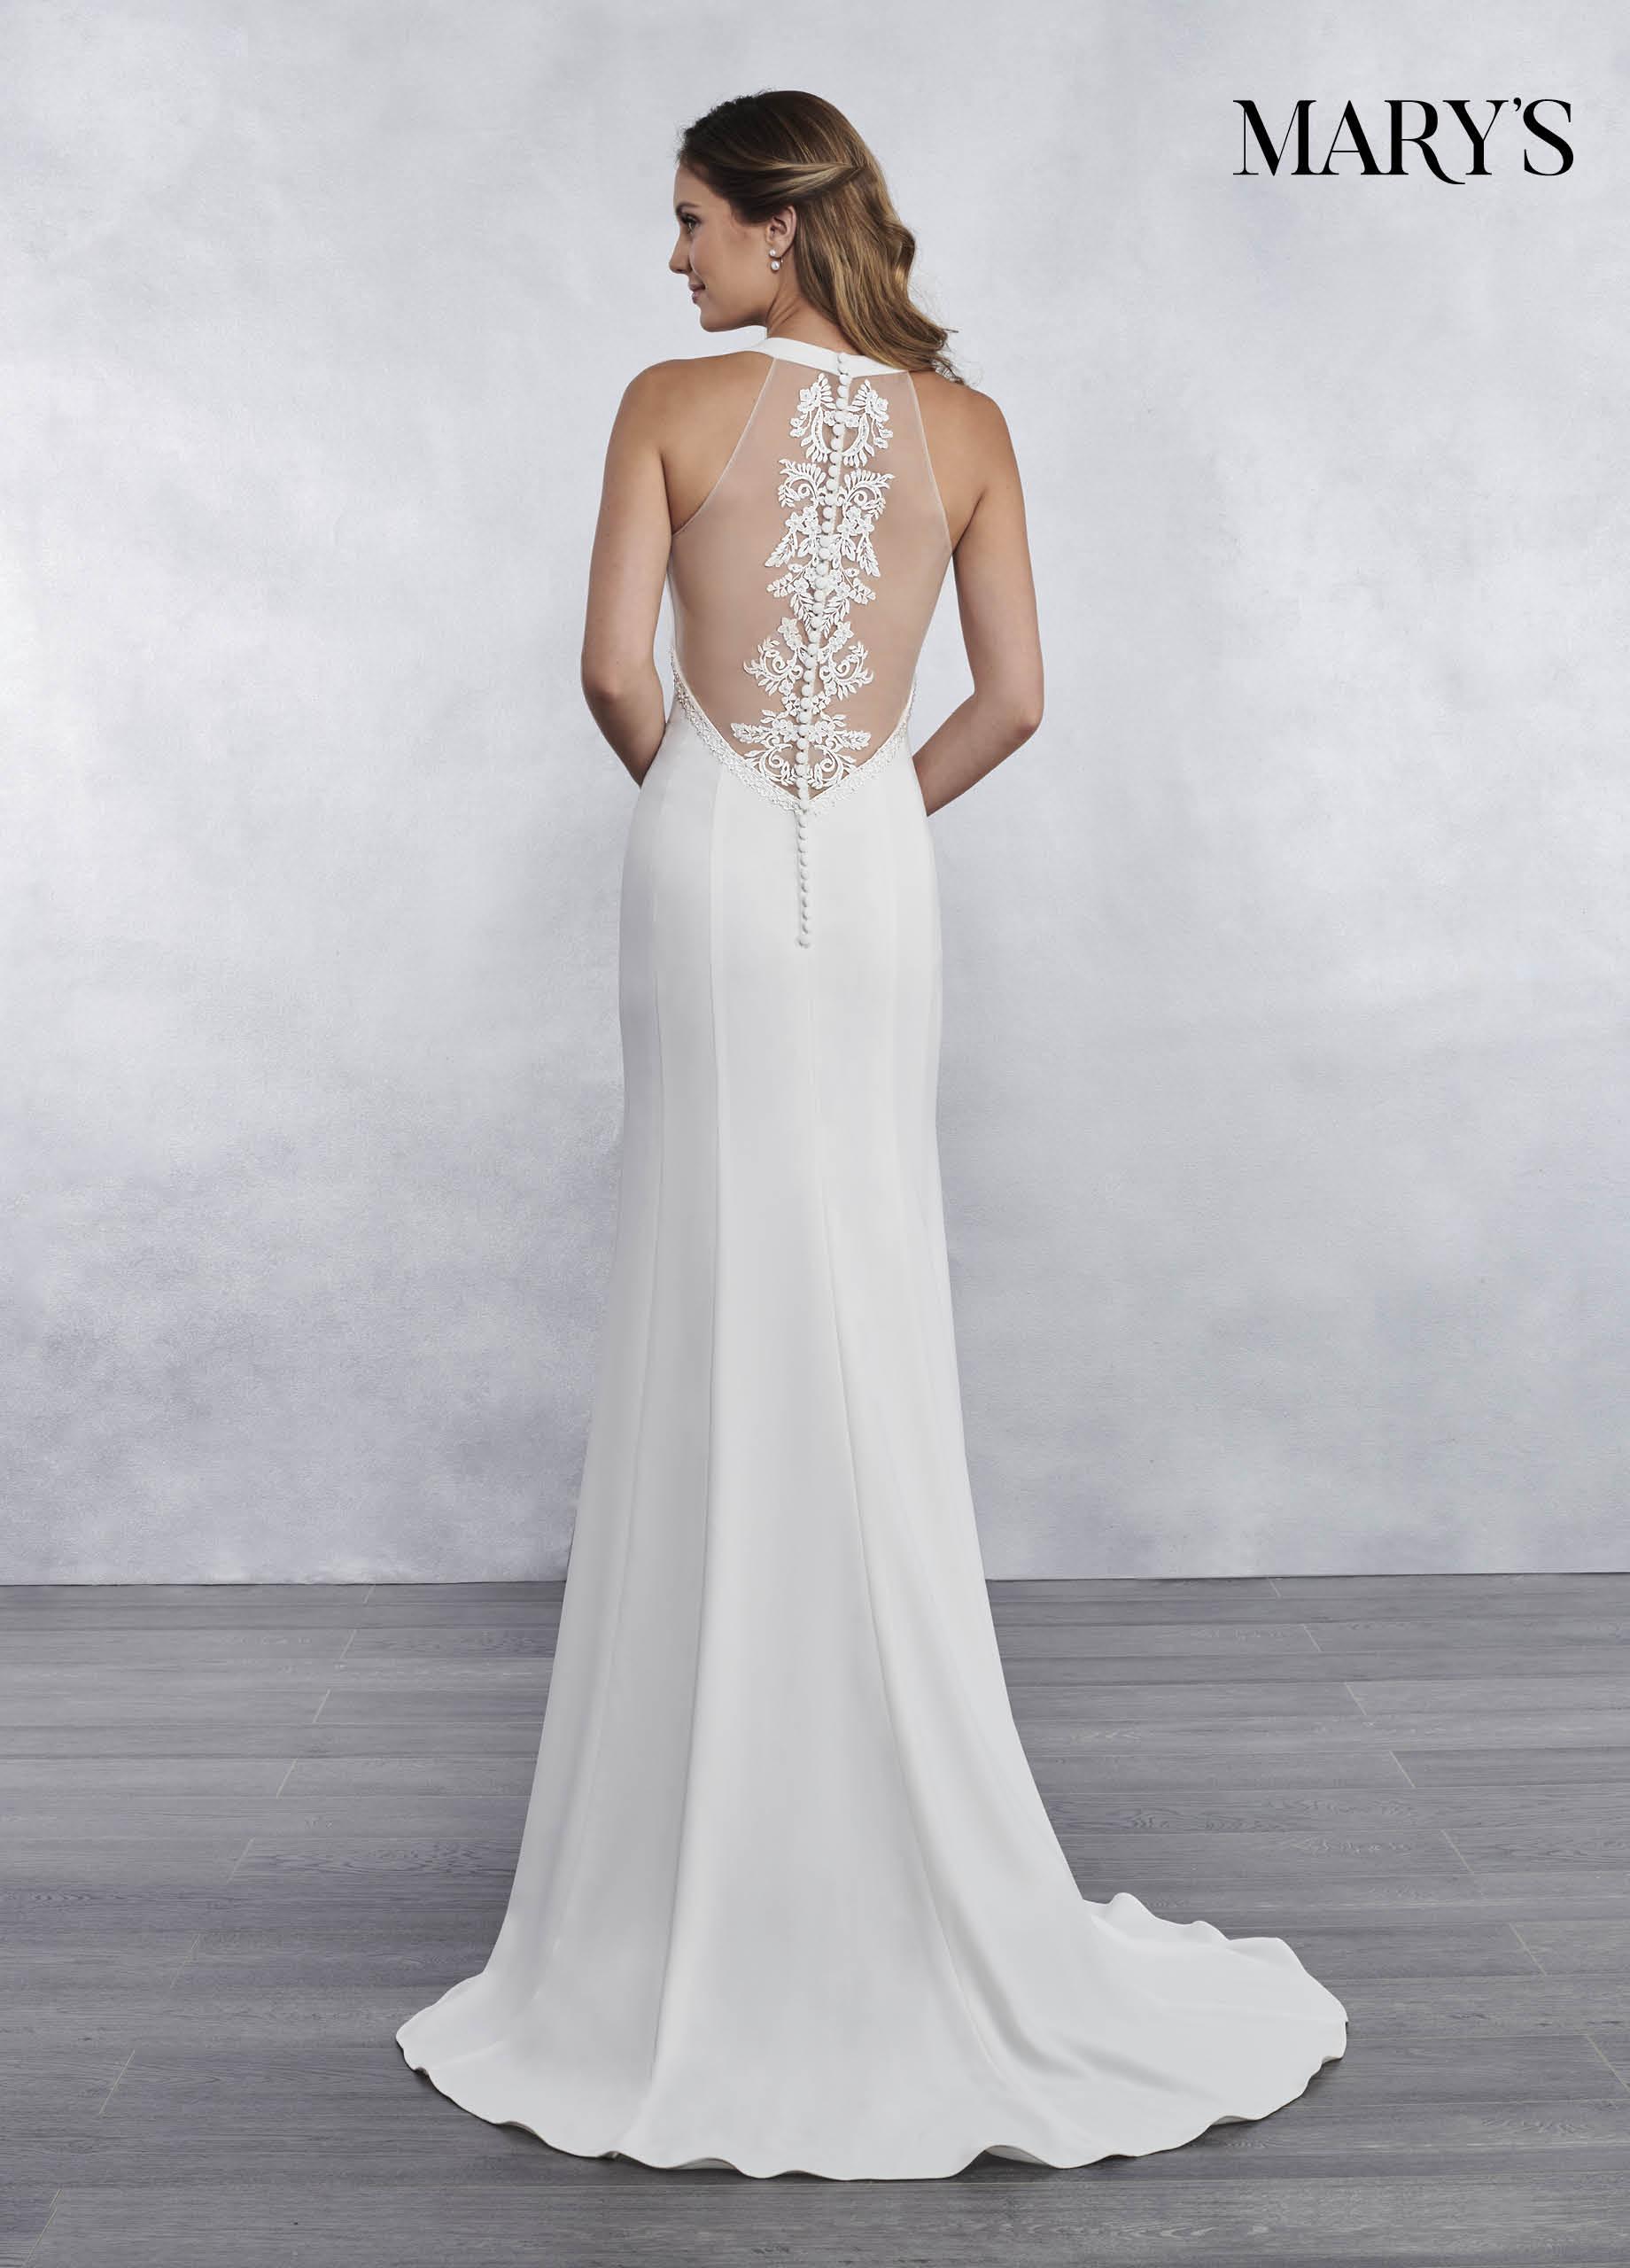 Bridal Wedding Dresses | Mary's | Style - MB1026